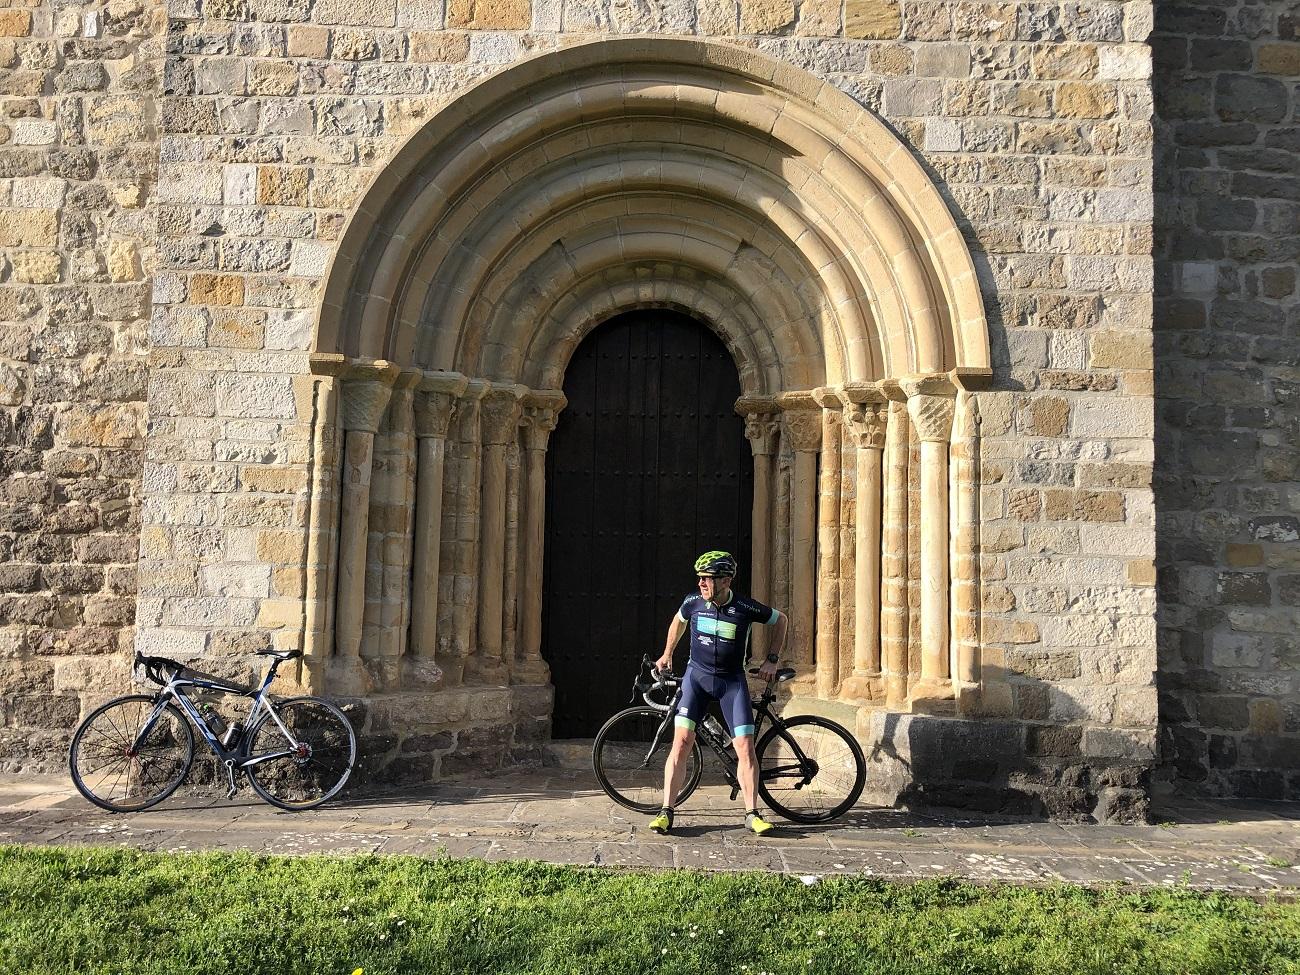 road biking saint james way